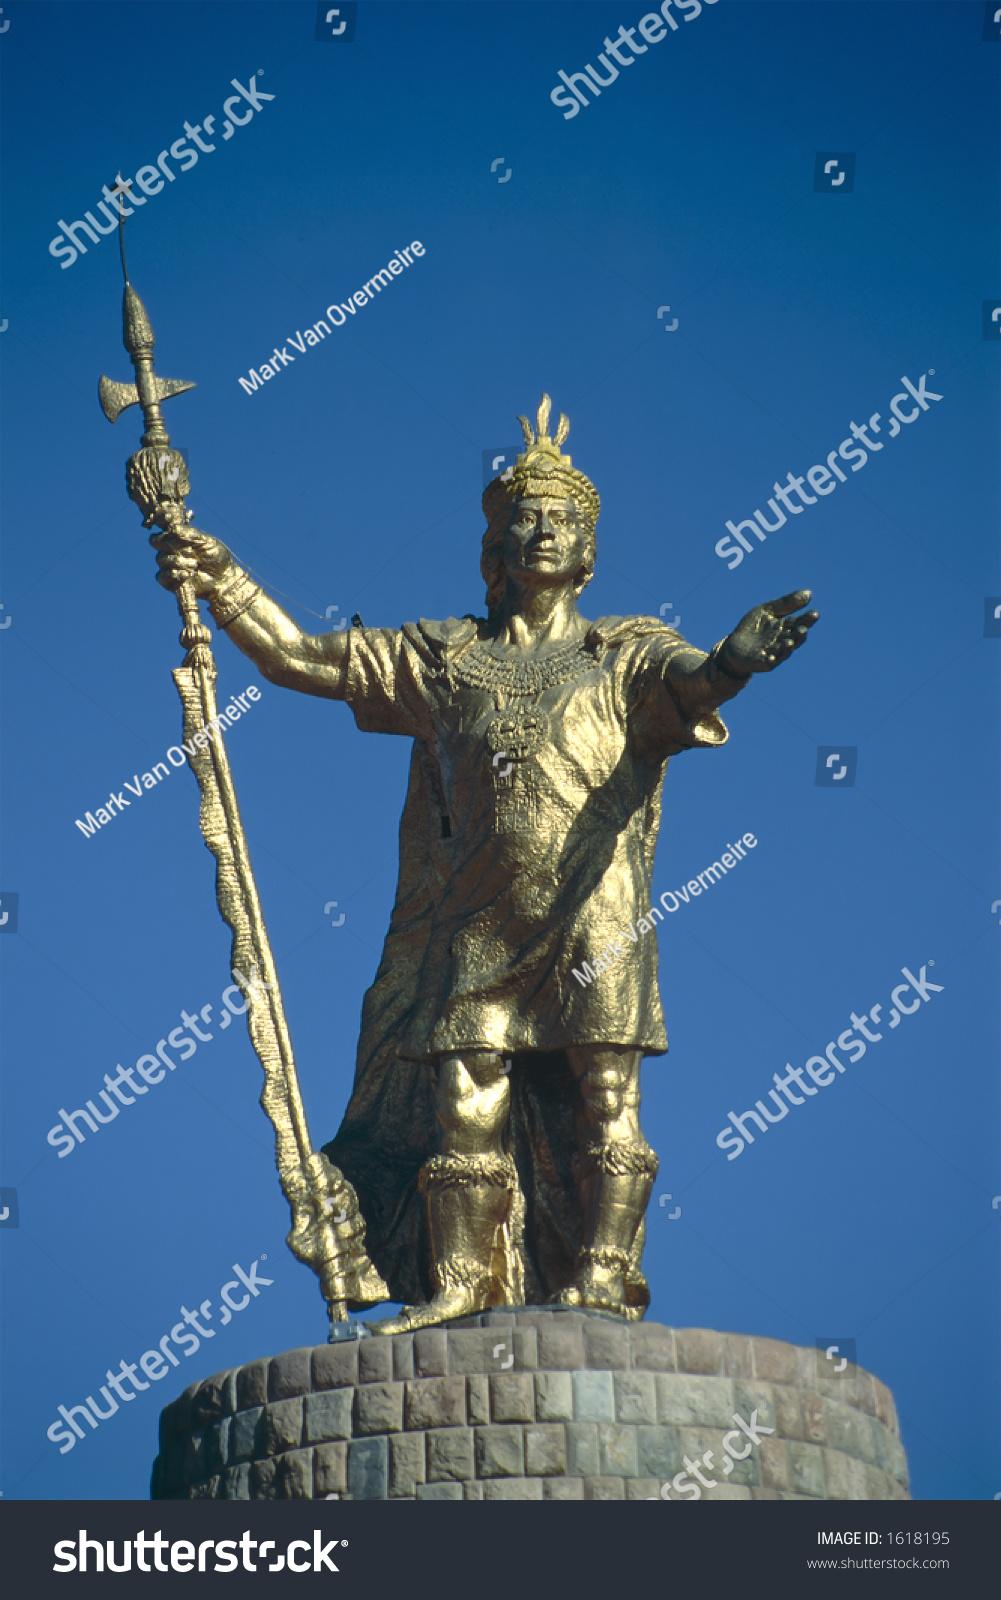 golden statue of the inca king atahualpa in cuzco peru